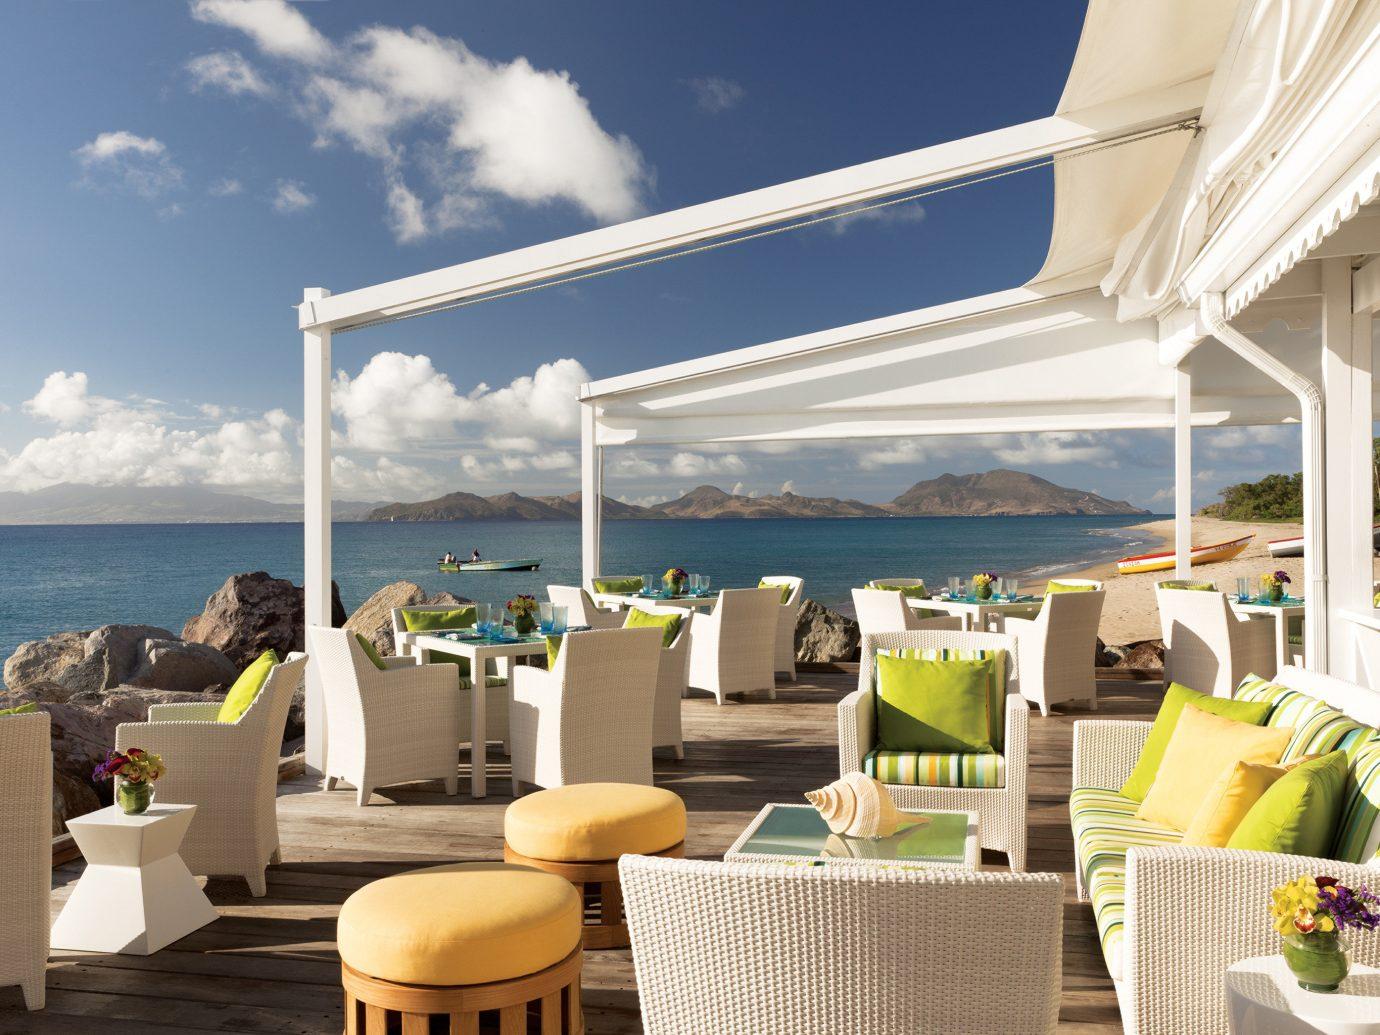 Hip Living Lounge Luxury Scenic views Trip Ideas sky vacation restaurant Resort interior design estate caribbean furniture day